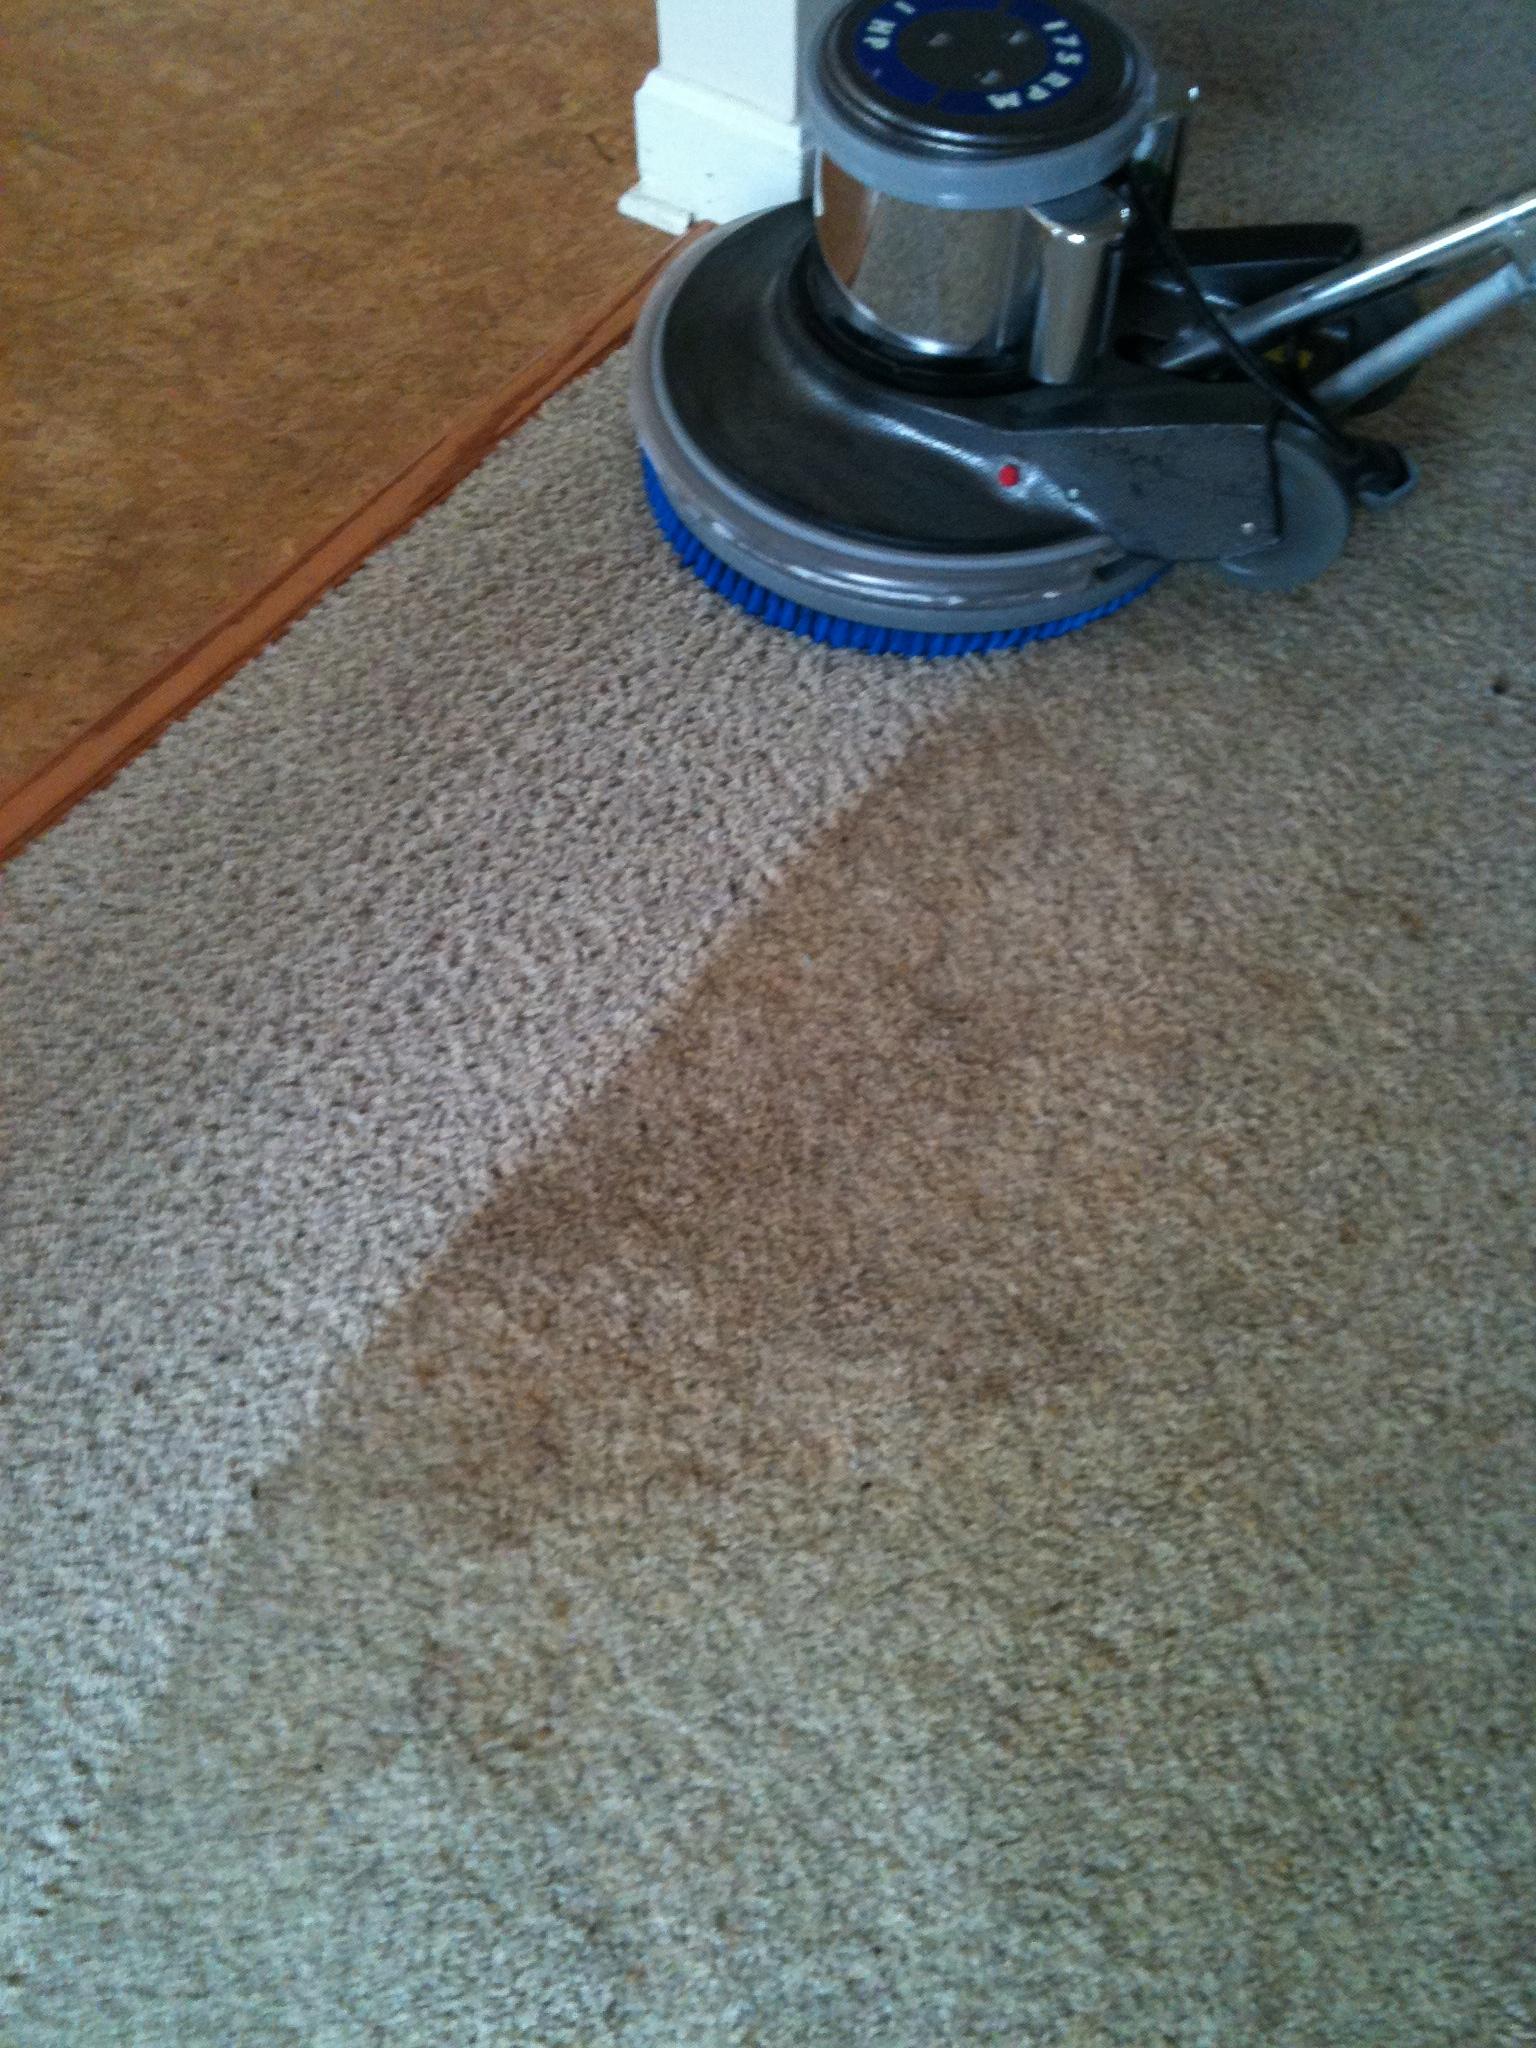 CitruSolution Carpet Cleaning image 1